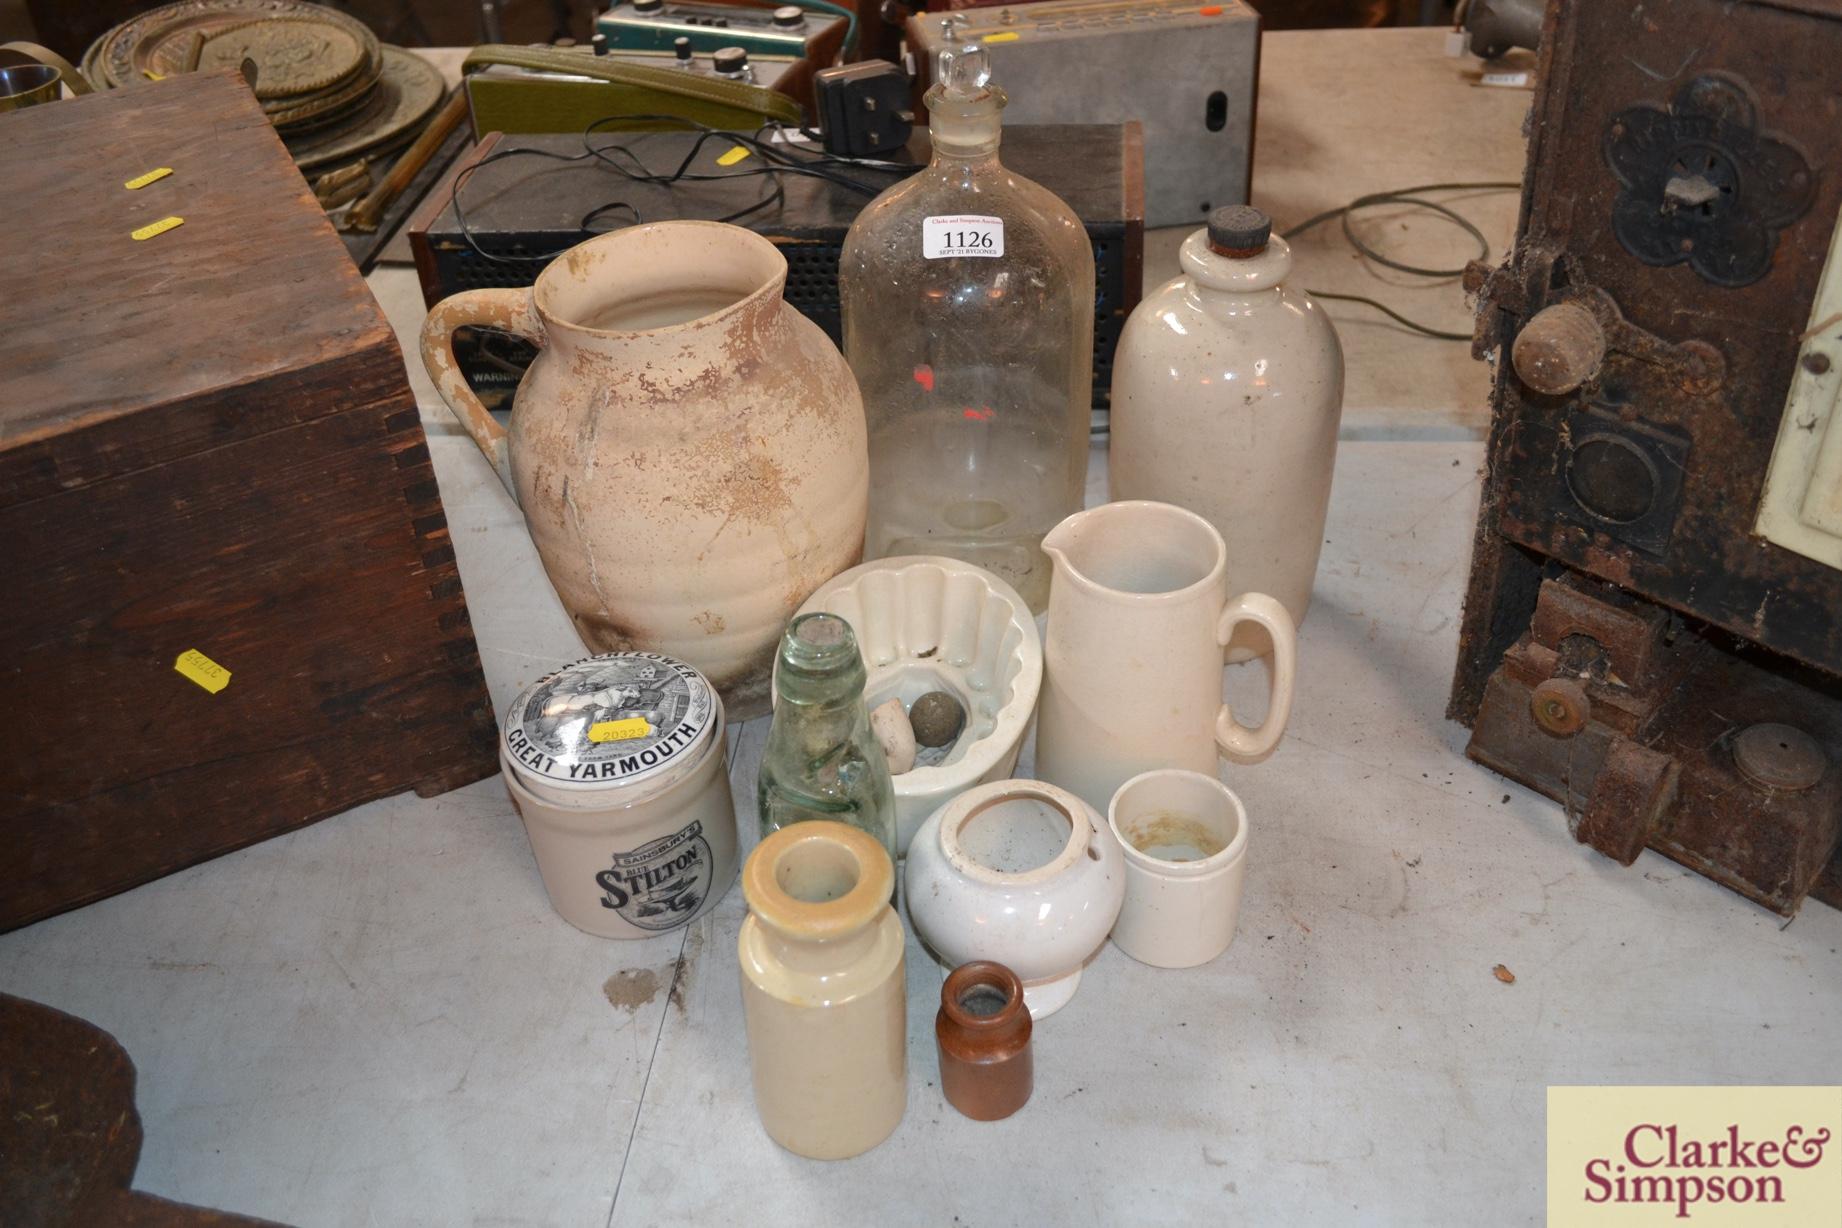 A white stone glazed bottle, a white china jelly m